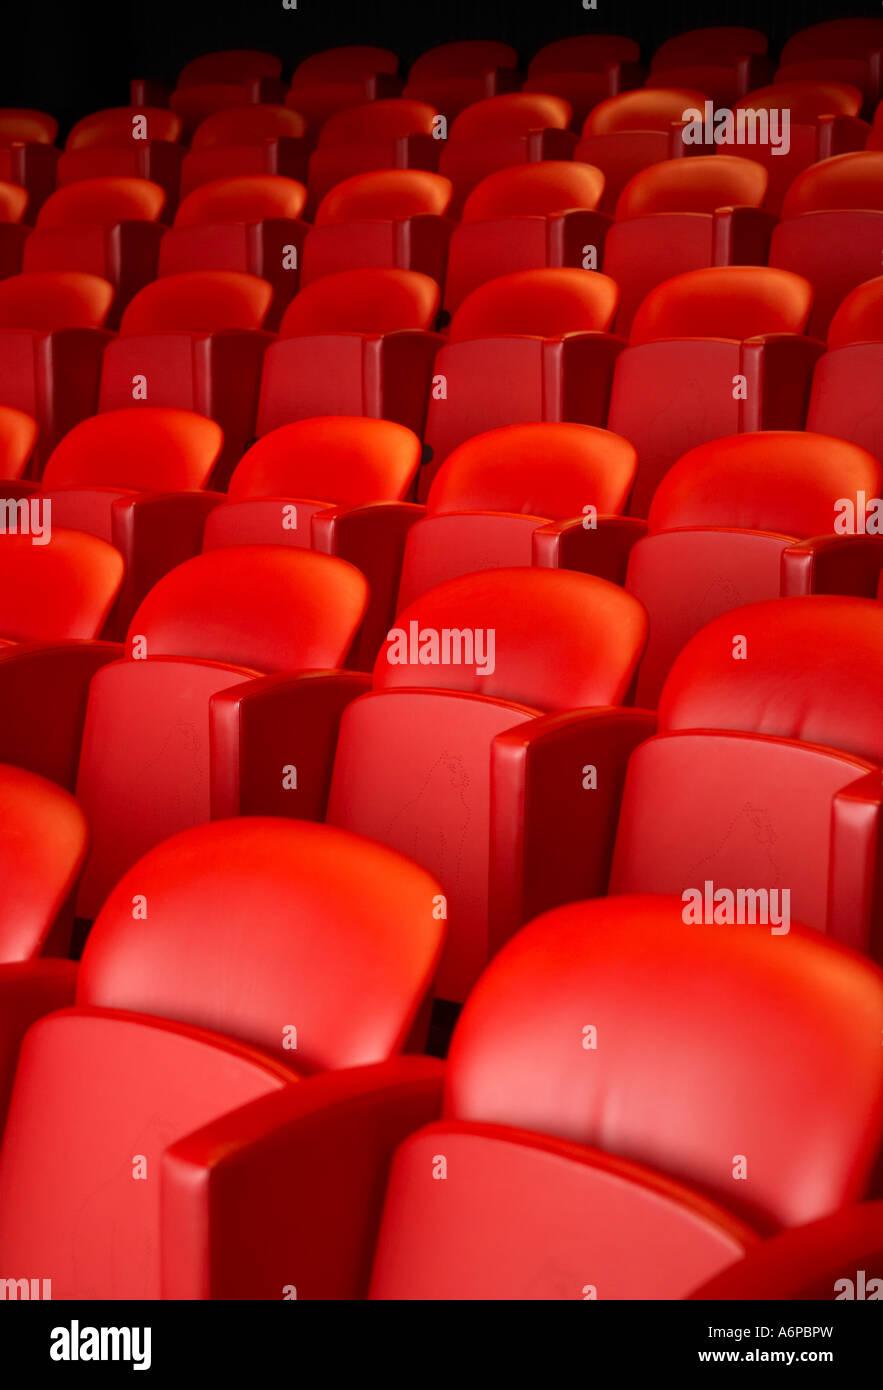 Red cinema seats - Stock Image